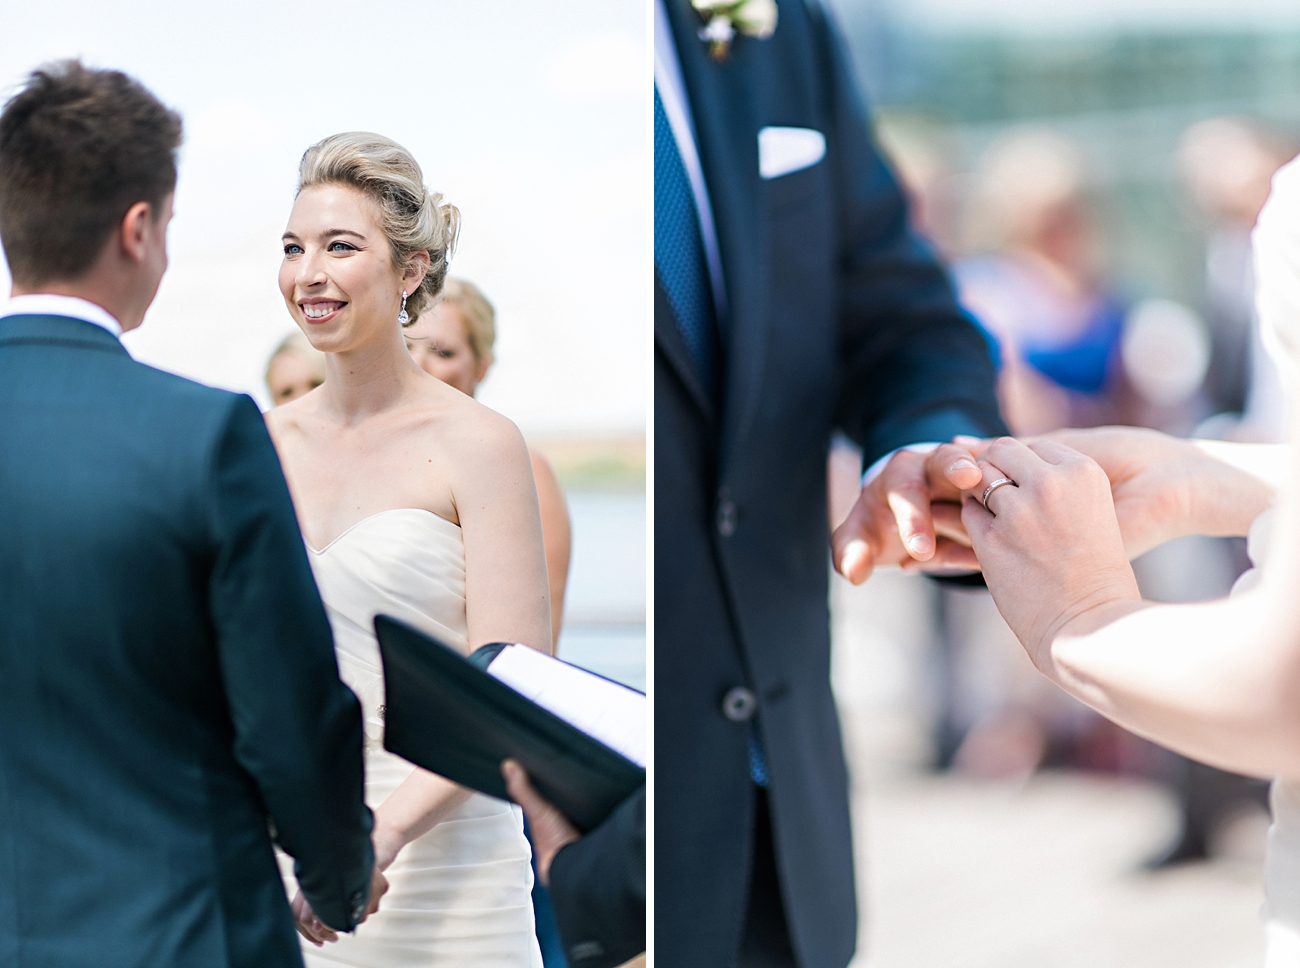 Sara-Seans-Halifax-Prince-George-Hotel-Wedding030.jpg